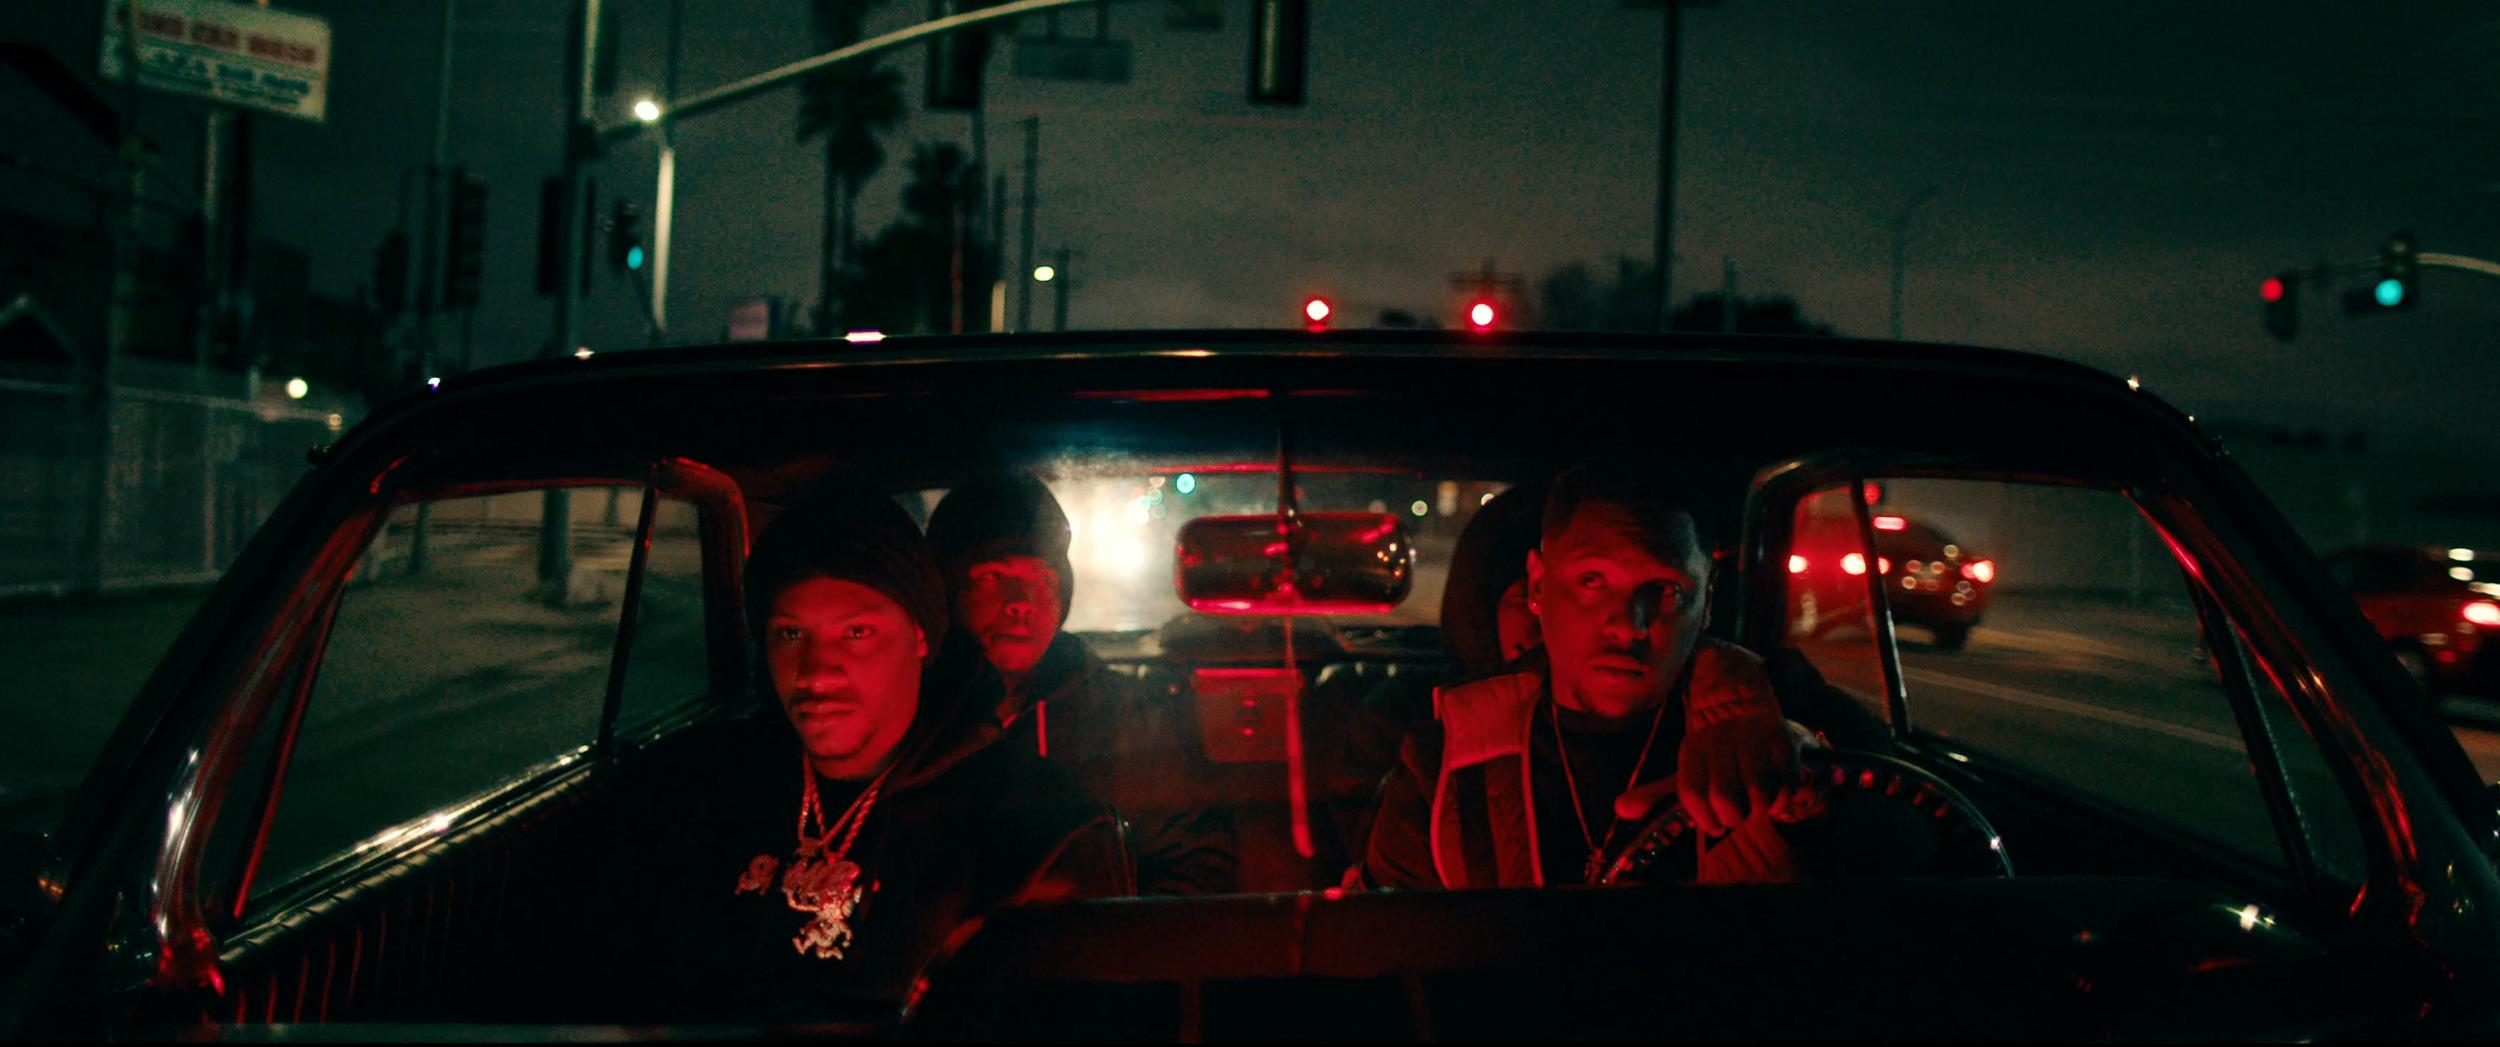 Hit-Boy - Family Not A Group ft. SOB x RBE